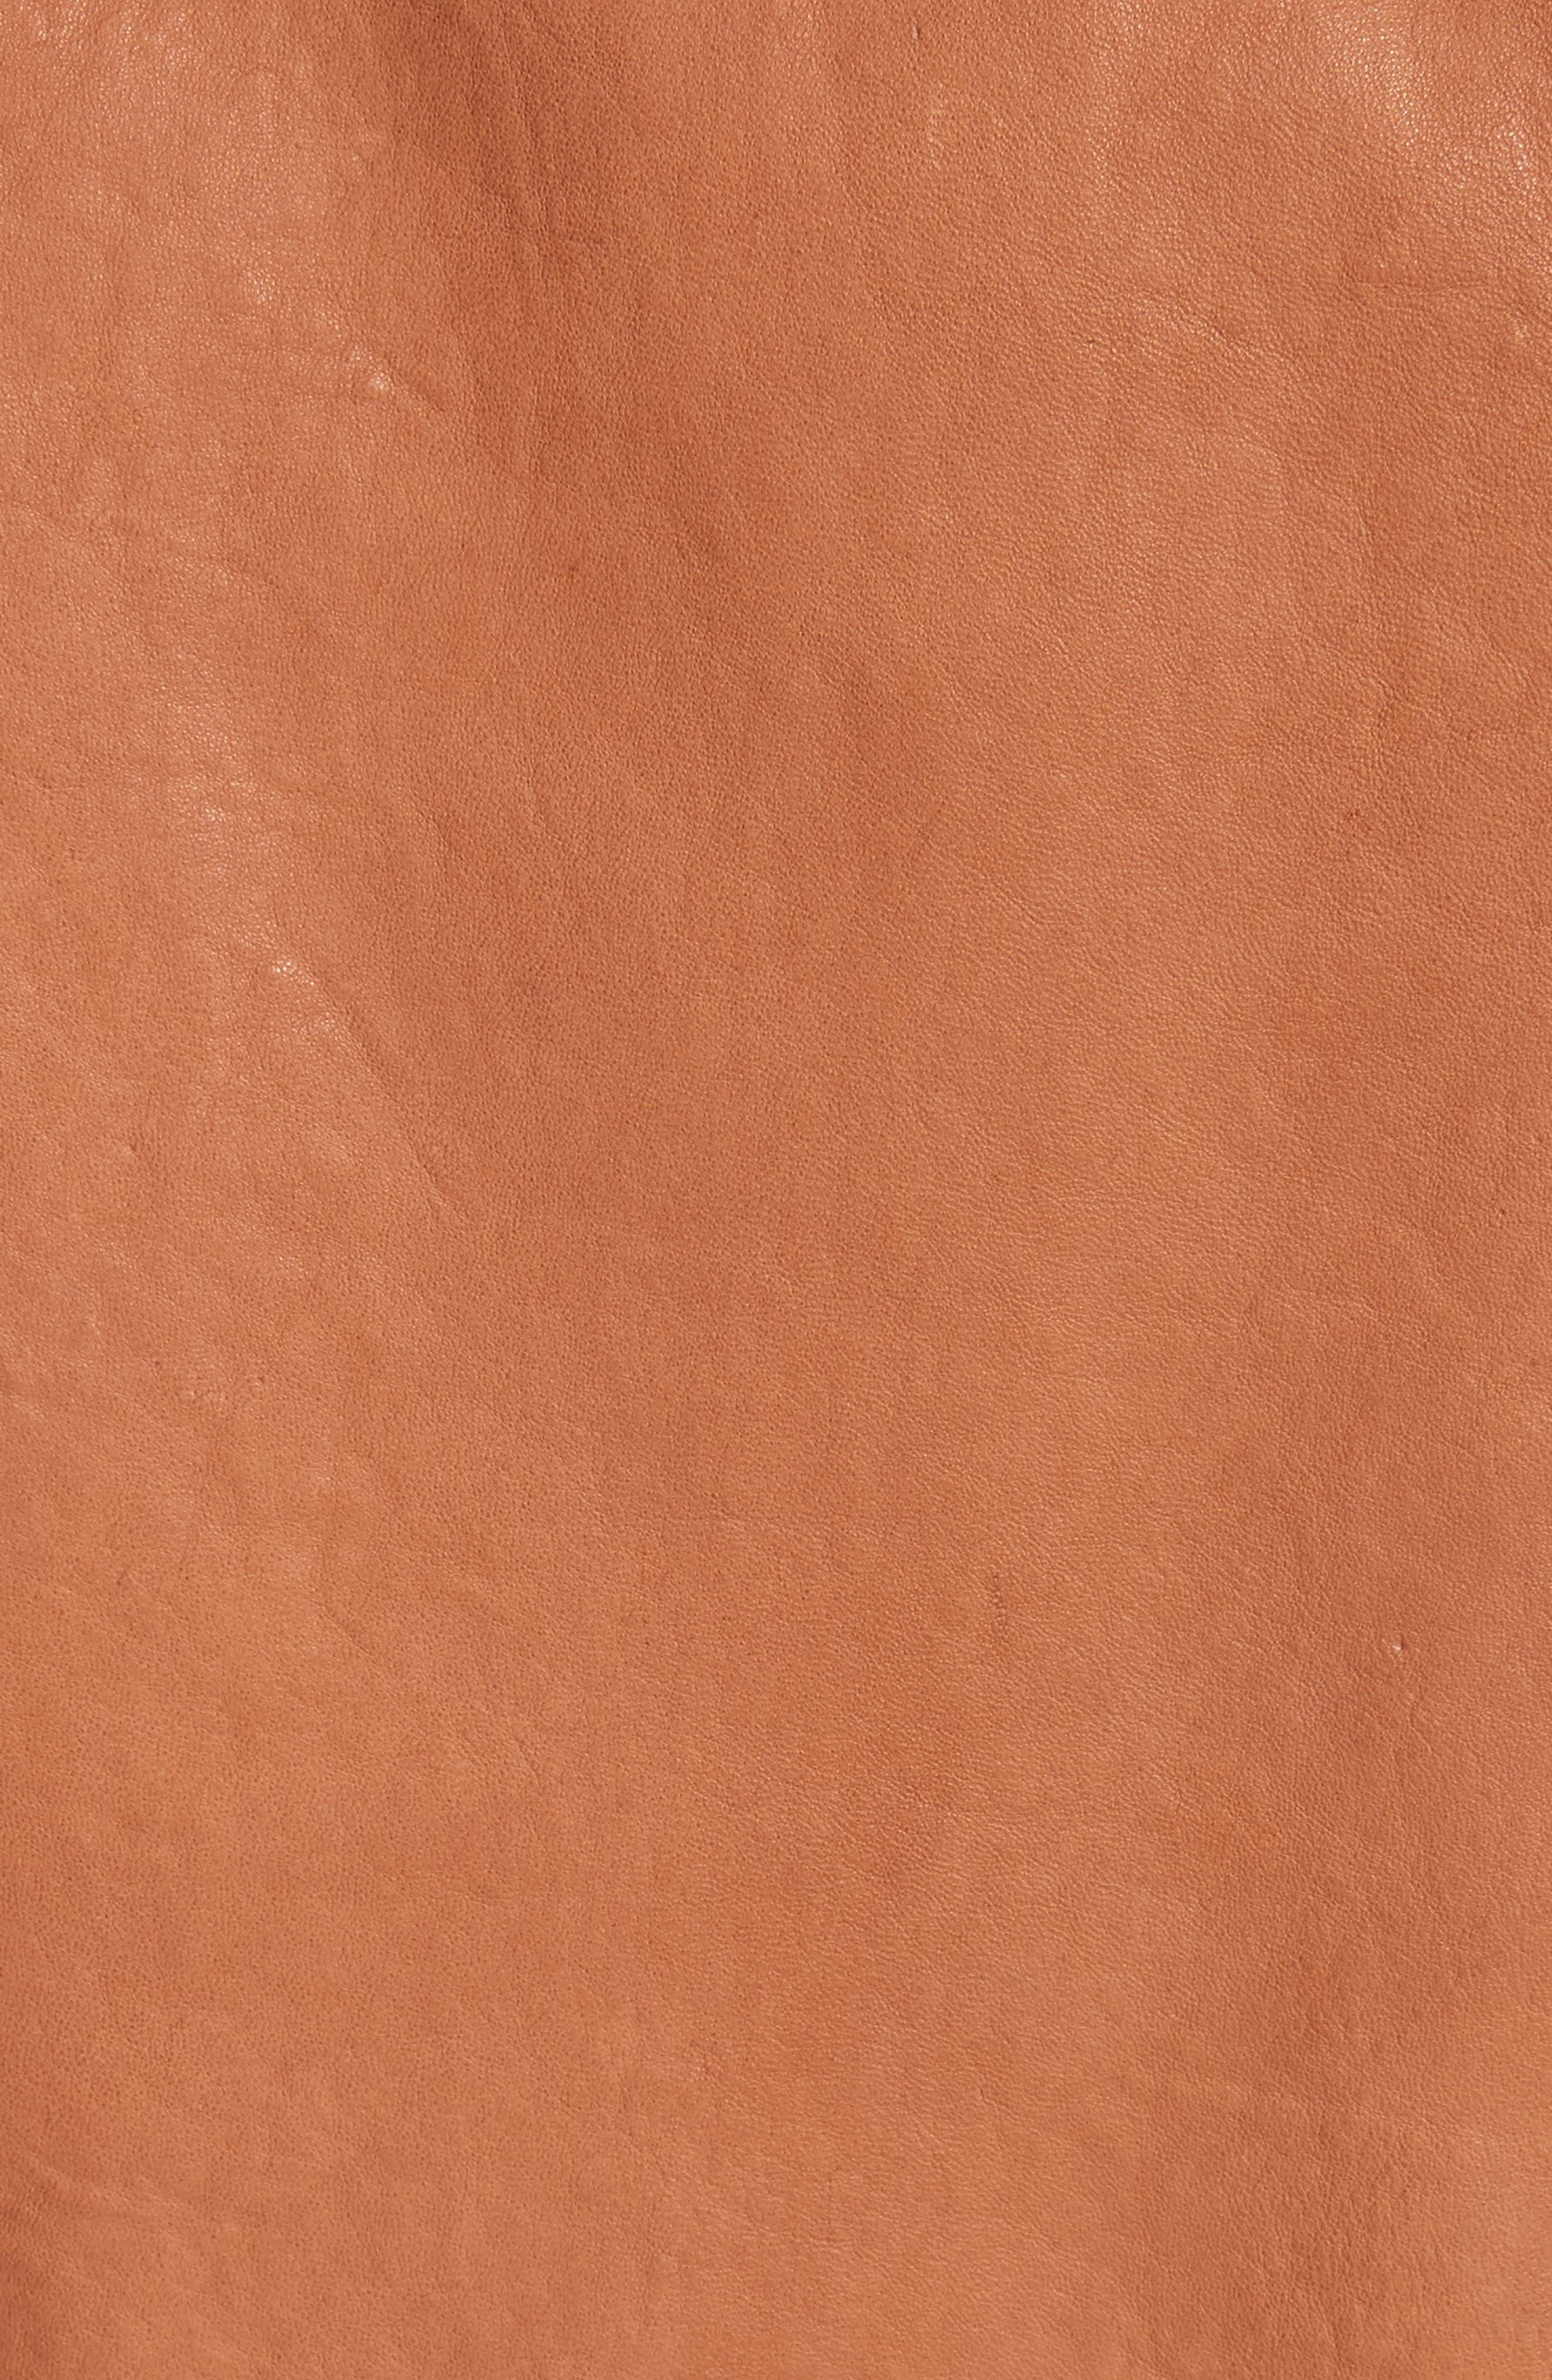 Lyon Leather Jacket,                             Alternate thumbnail 6, color,                             200